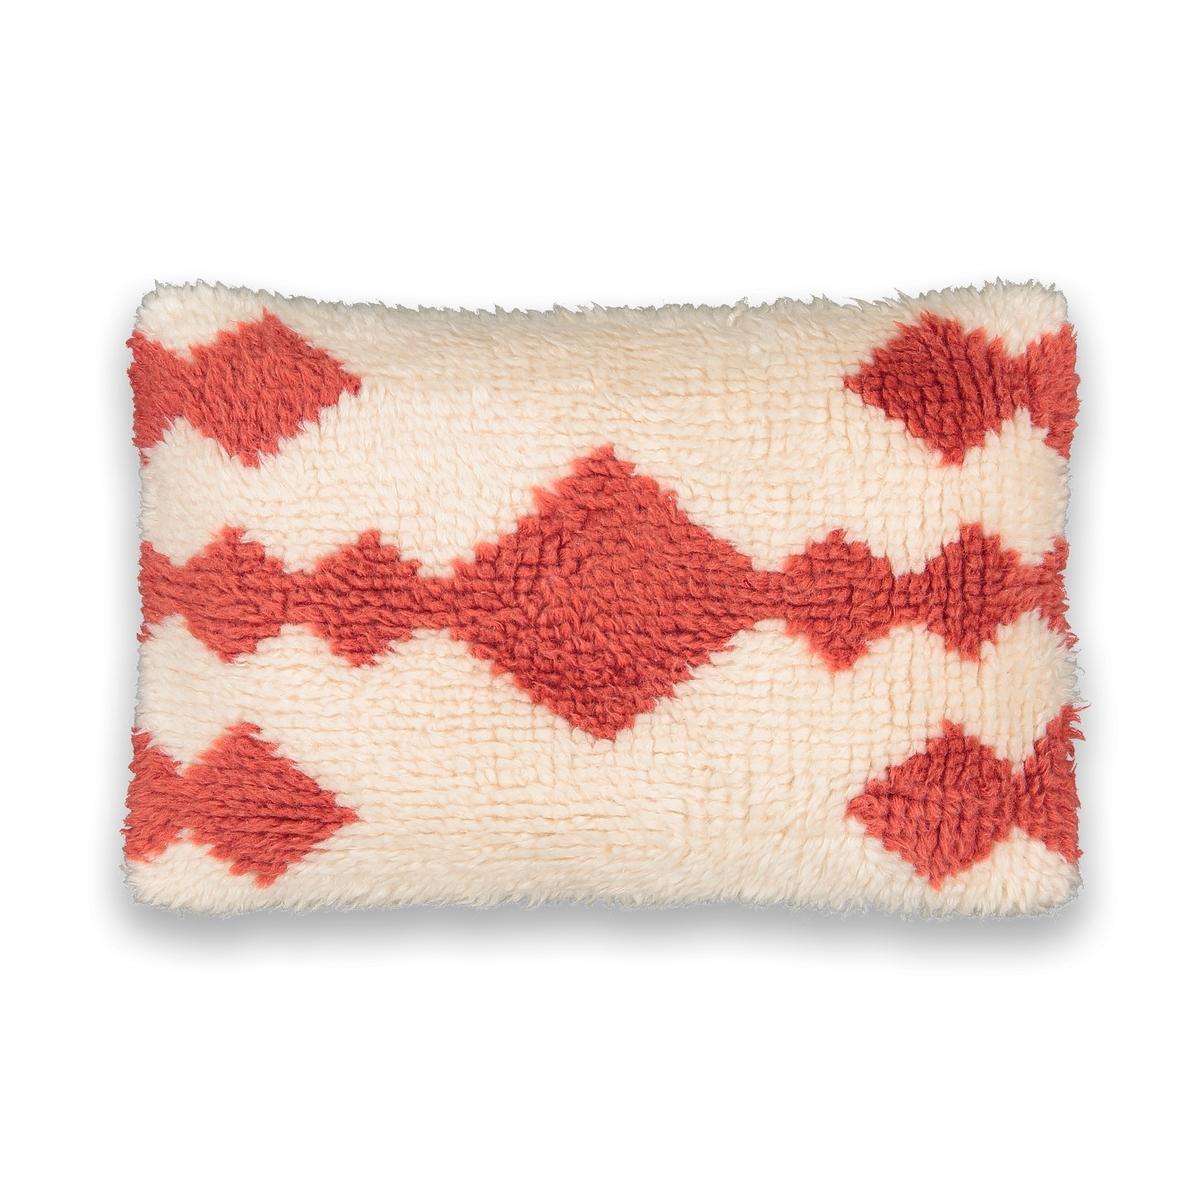 Чехол La Redoute На подушку-валик в берберском стиле Isigiqo 60 x 40 см оранжевый ковер la redoute в берберском стиле из шерсти tekouma 120 x 180 см бежевый